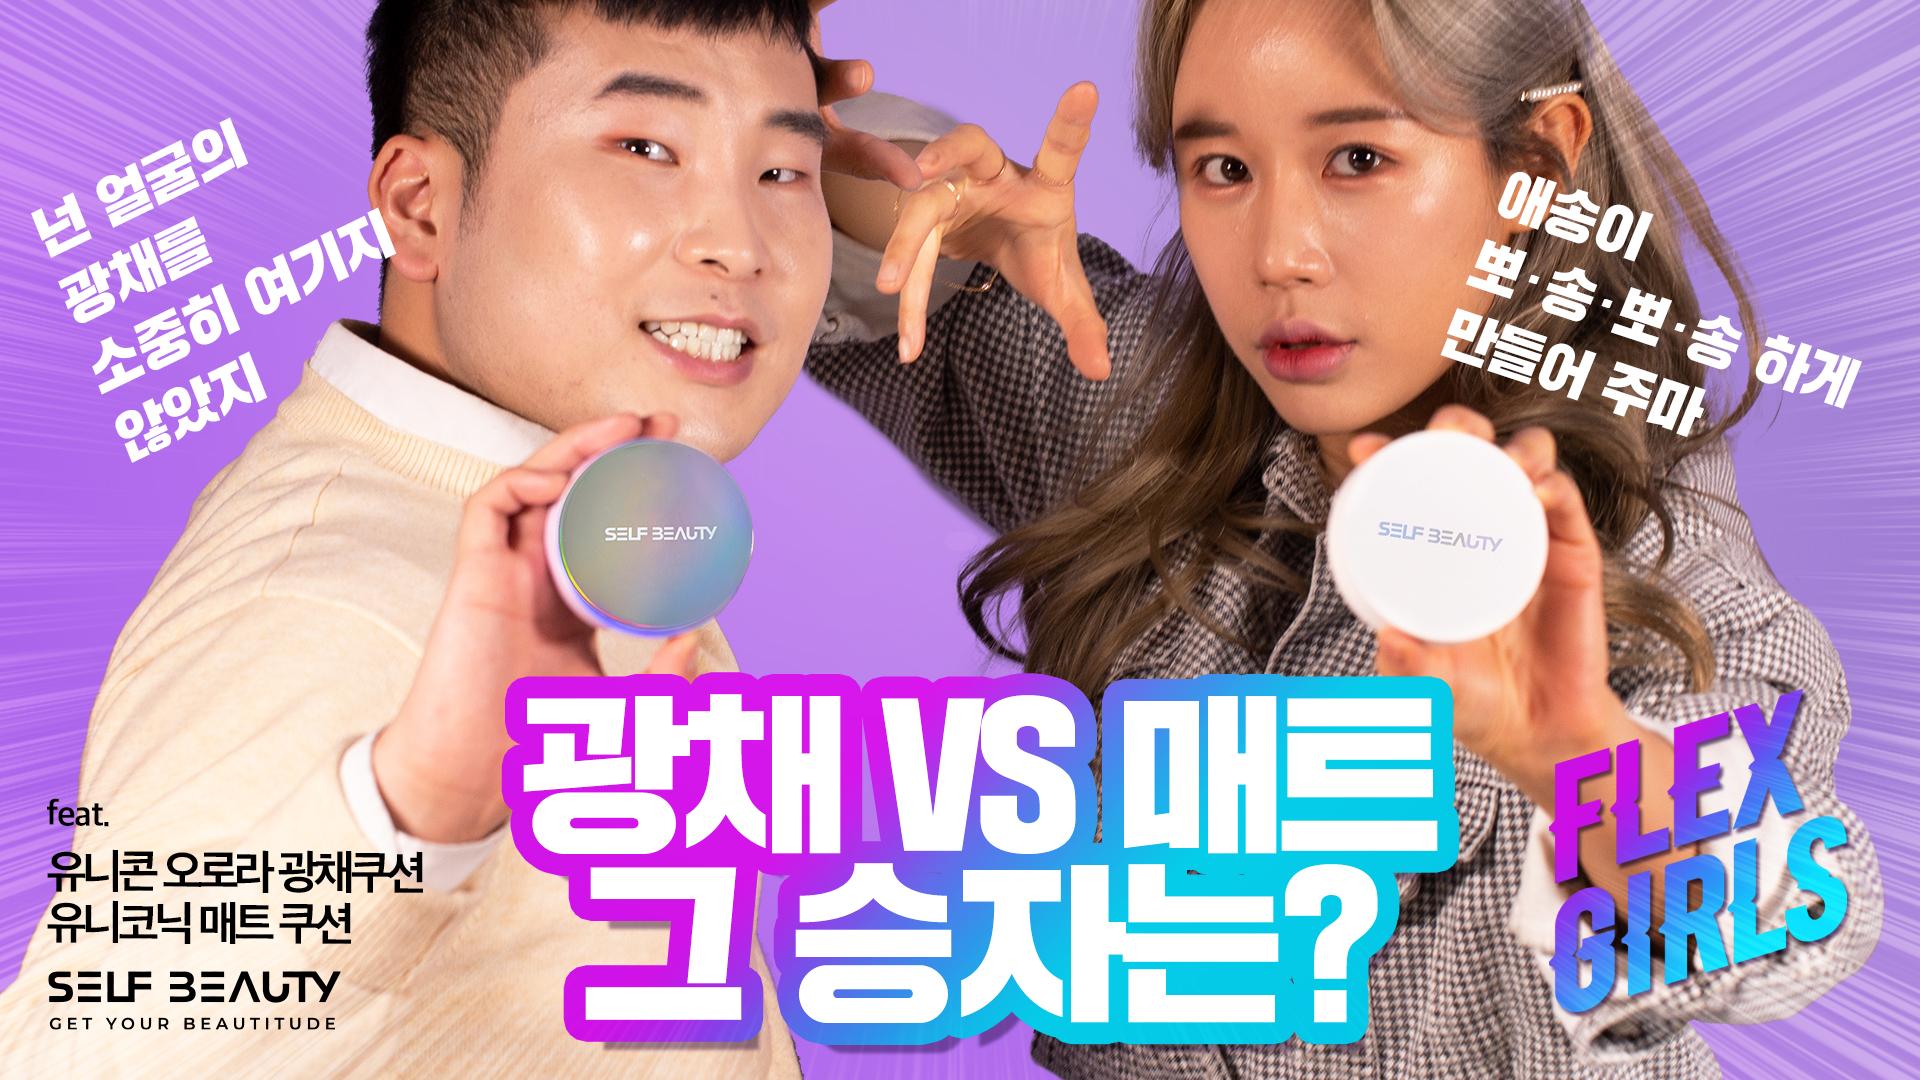 💥Flex Girls 👱🏻♀️지성 박서울 vs 👦🏻건성 죠지/광채쿠션 vs 매트쿠션 대결